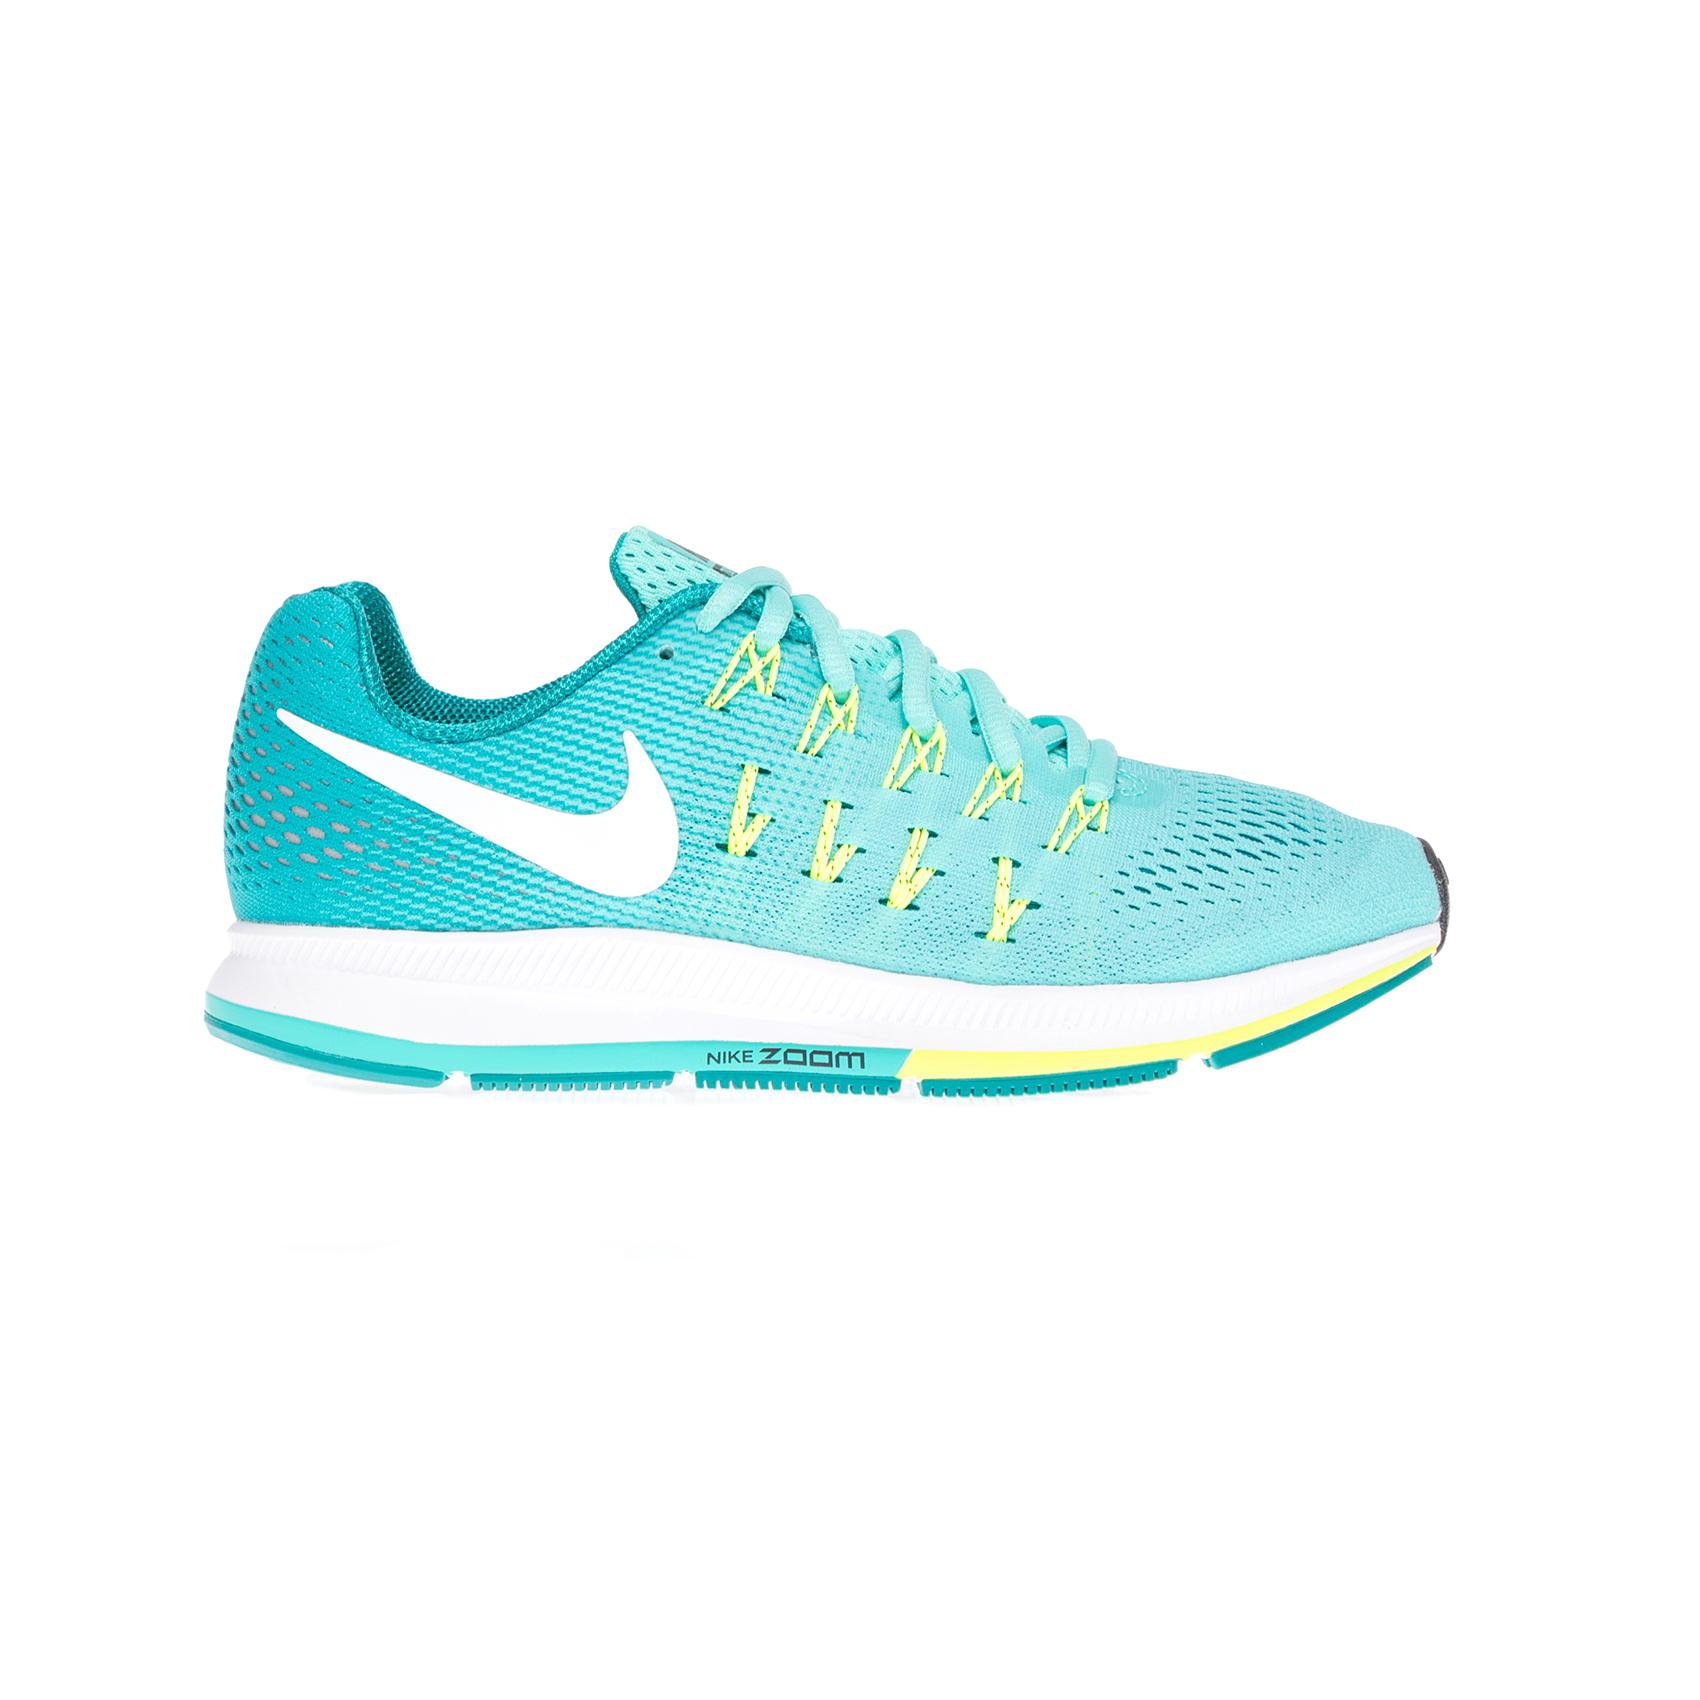 NIKE – Γυναικεία αθλητικά παπούτσια NIKE AIR ZOOM PEGASUS 33 μπλε.  Factoryoutlet e9df3dd8dee